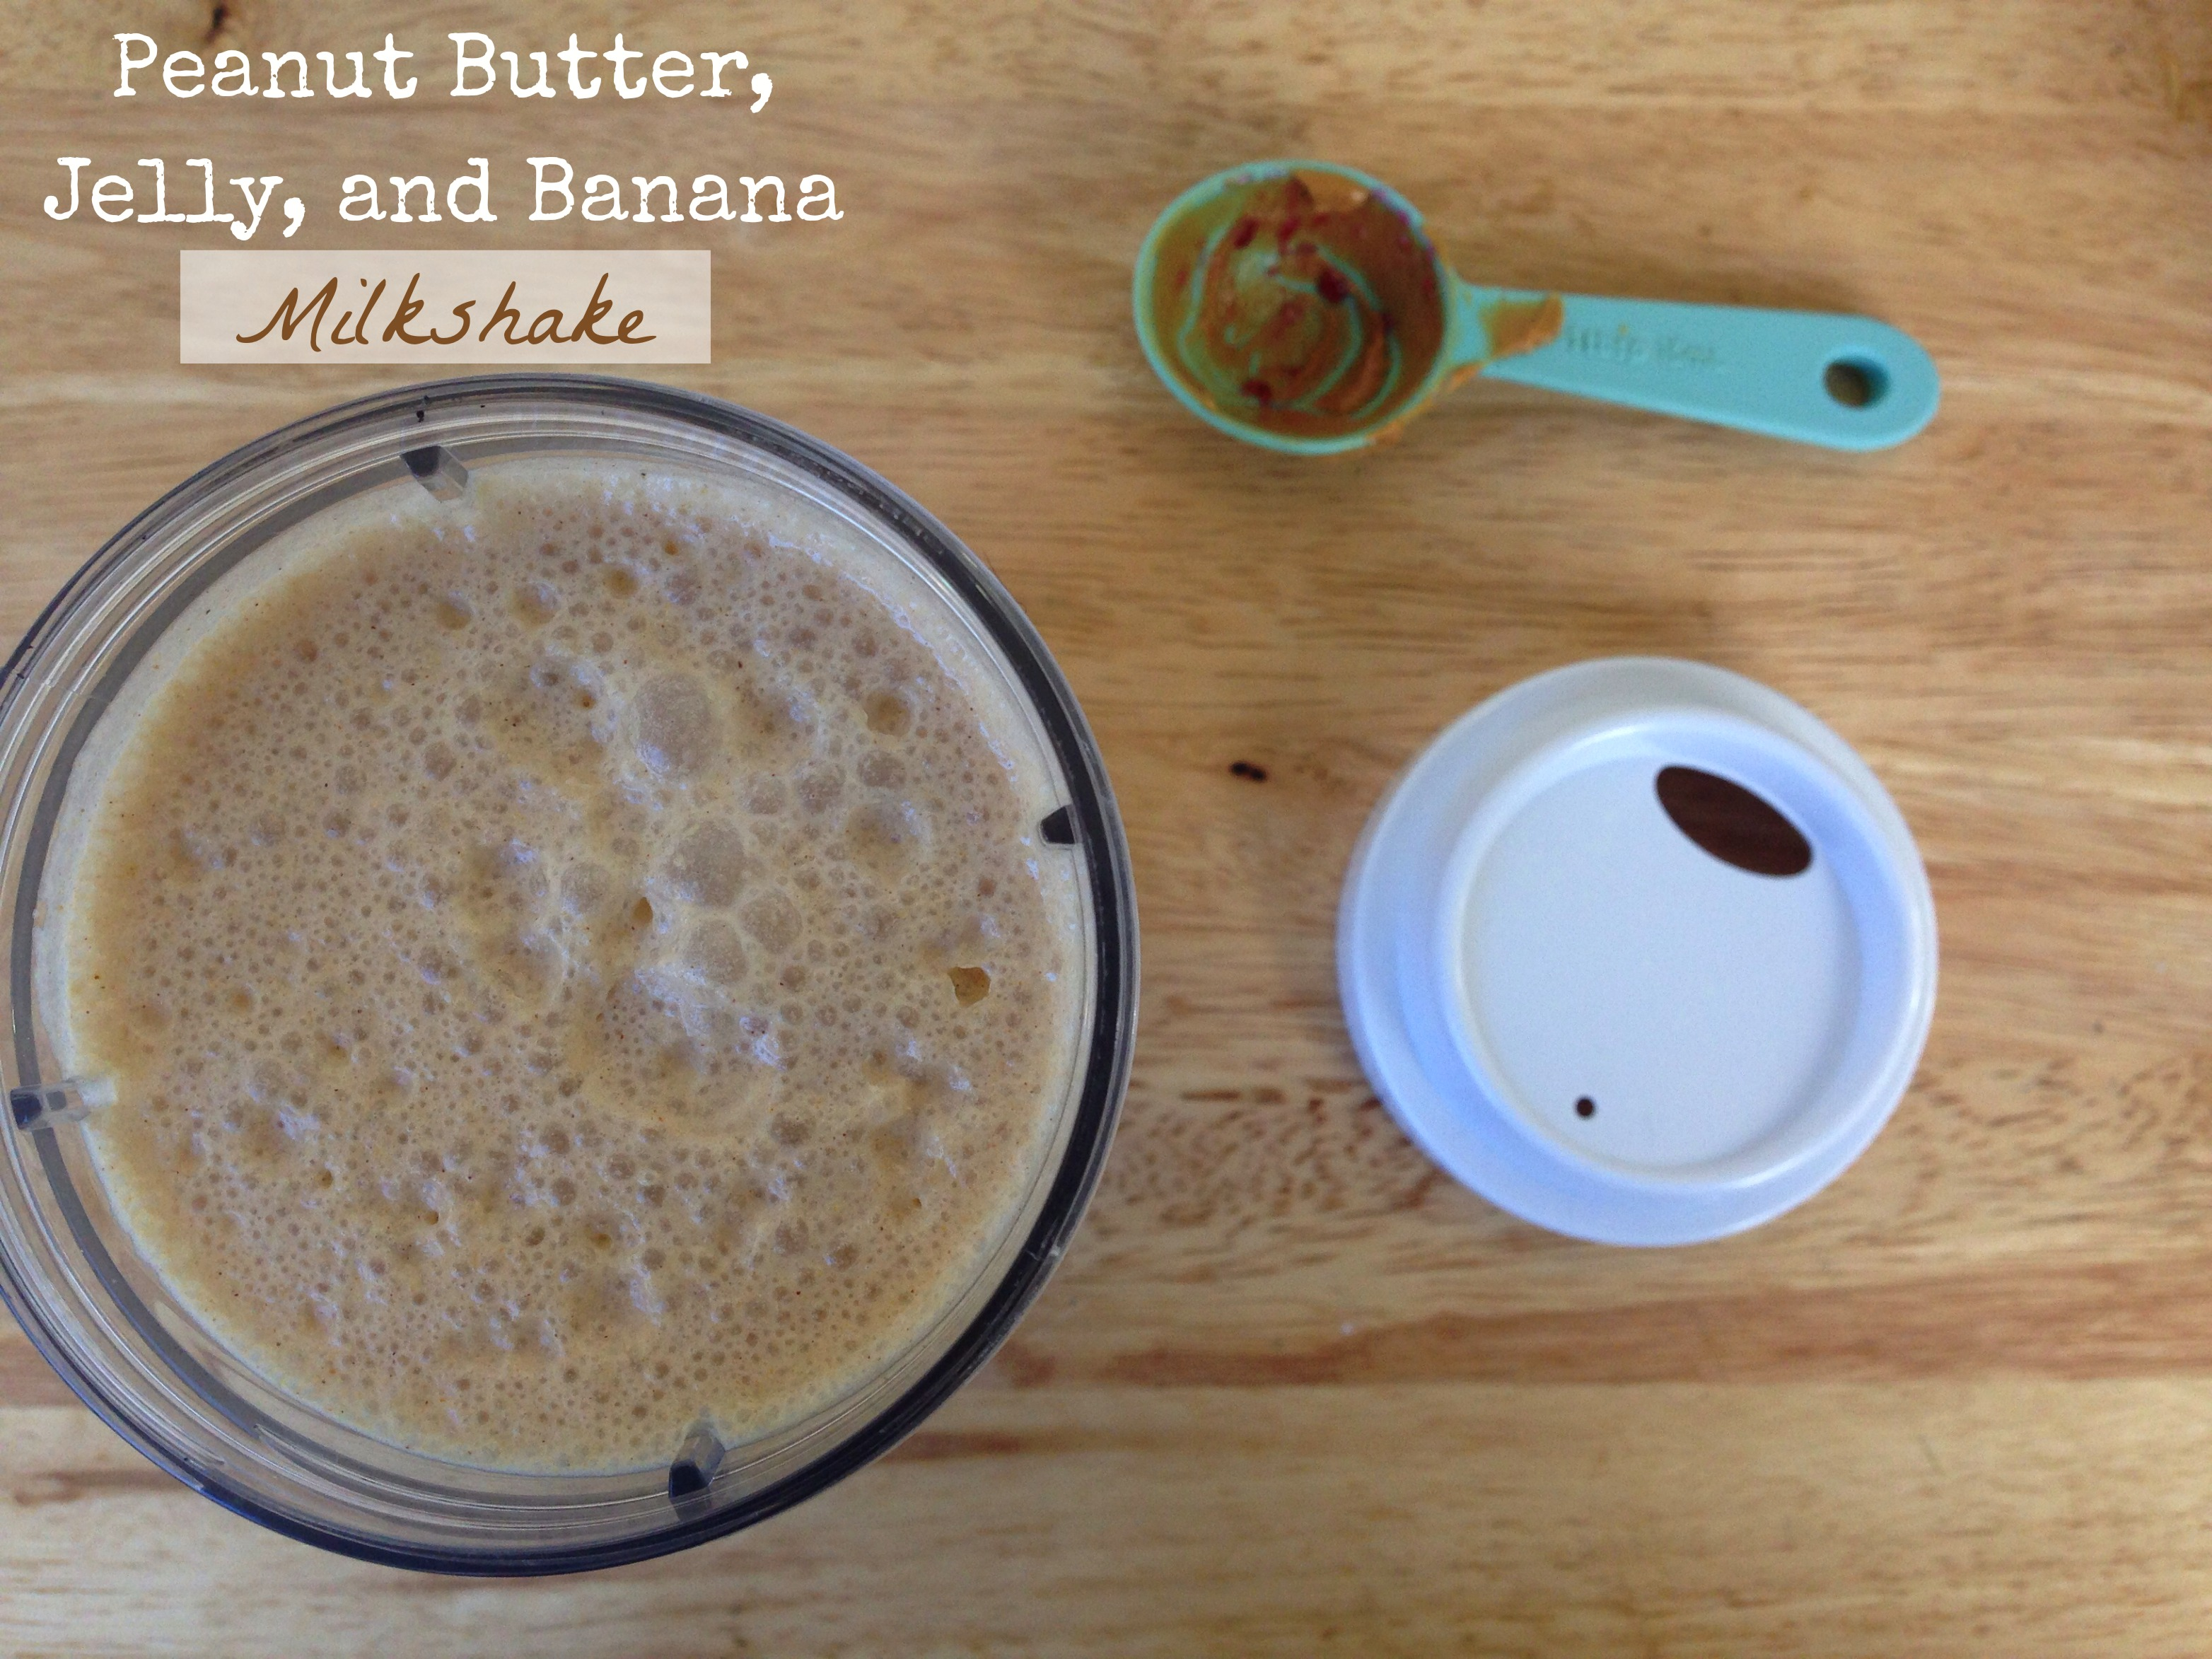 Peanut Butter, Jelly, and Banana Milkshake